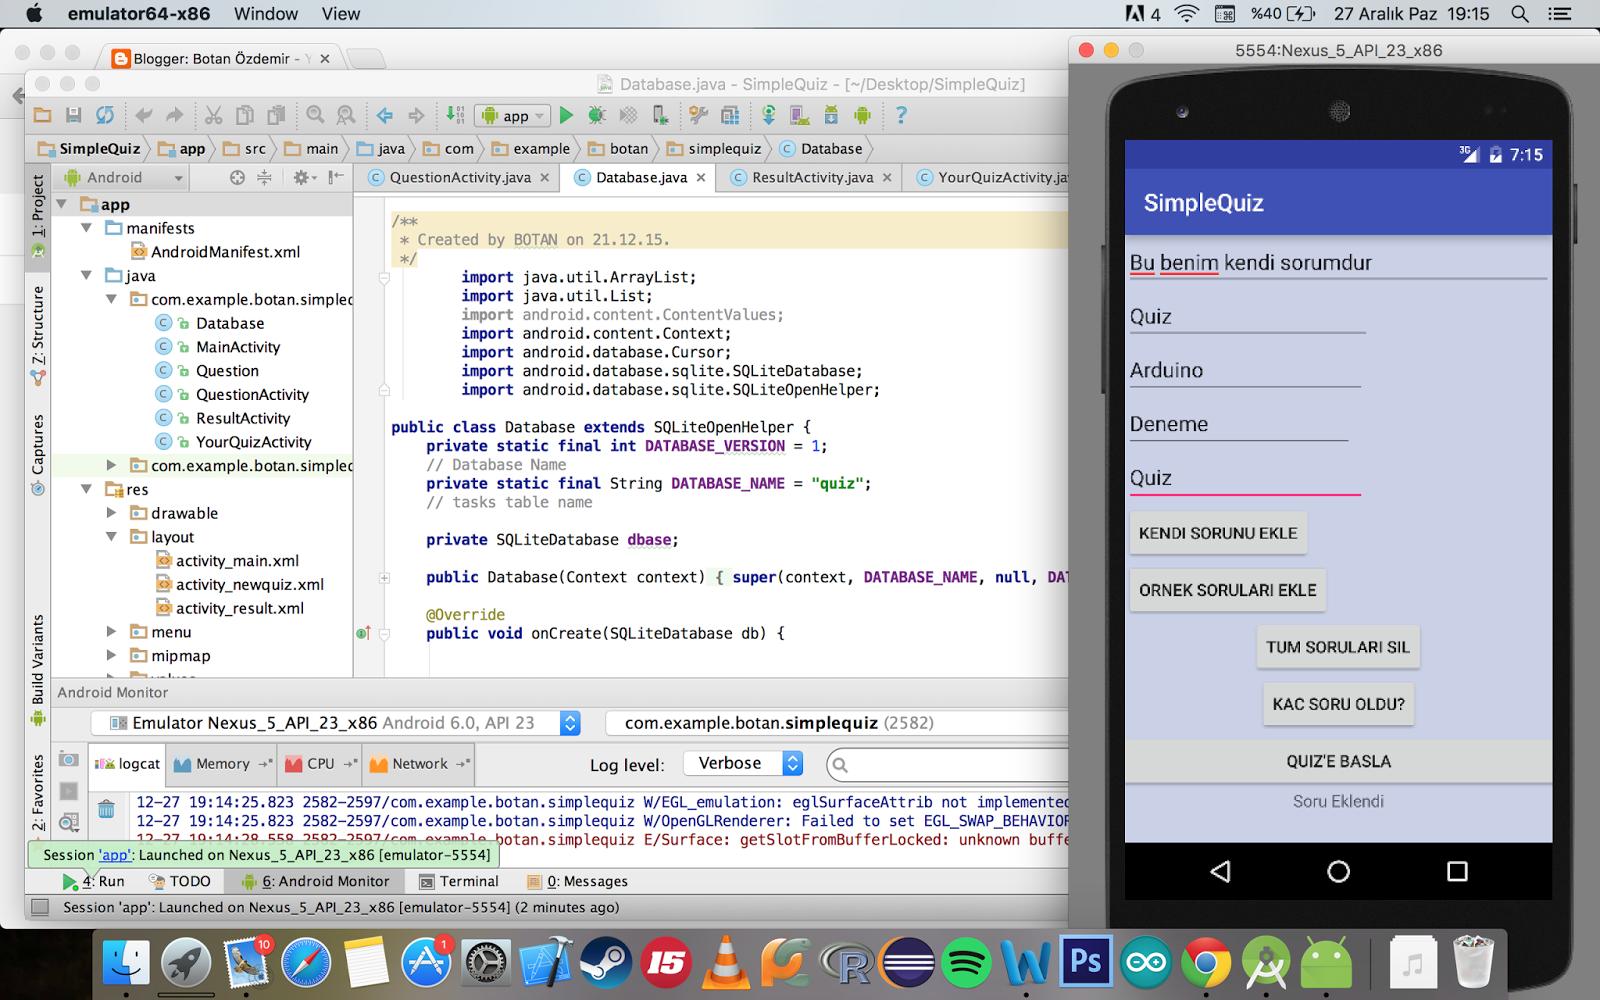 Botan Özdemir: Simple Quiz App with using Android Studio and SQLite